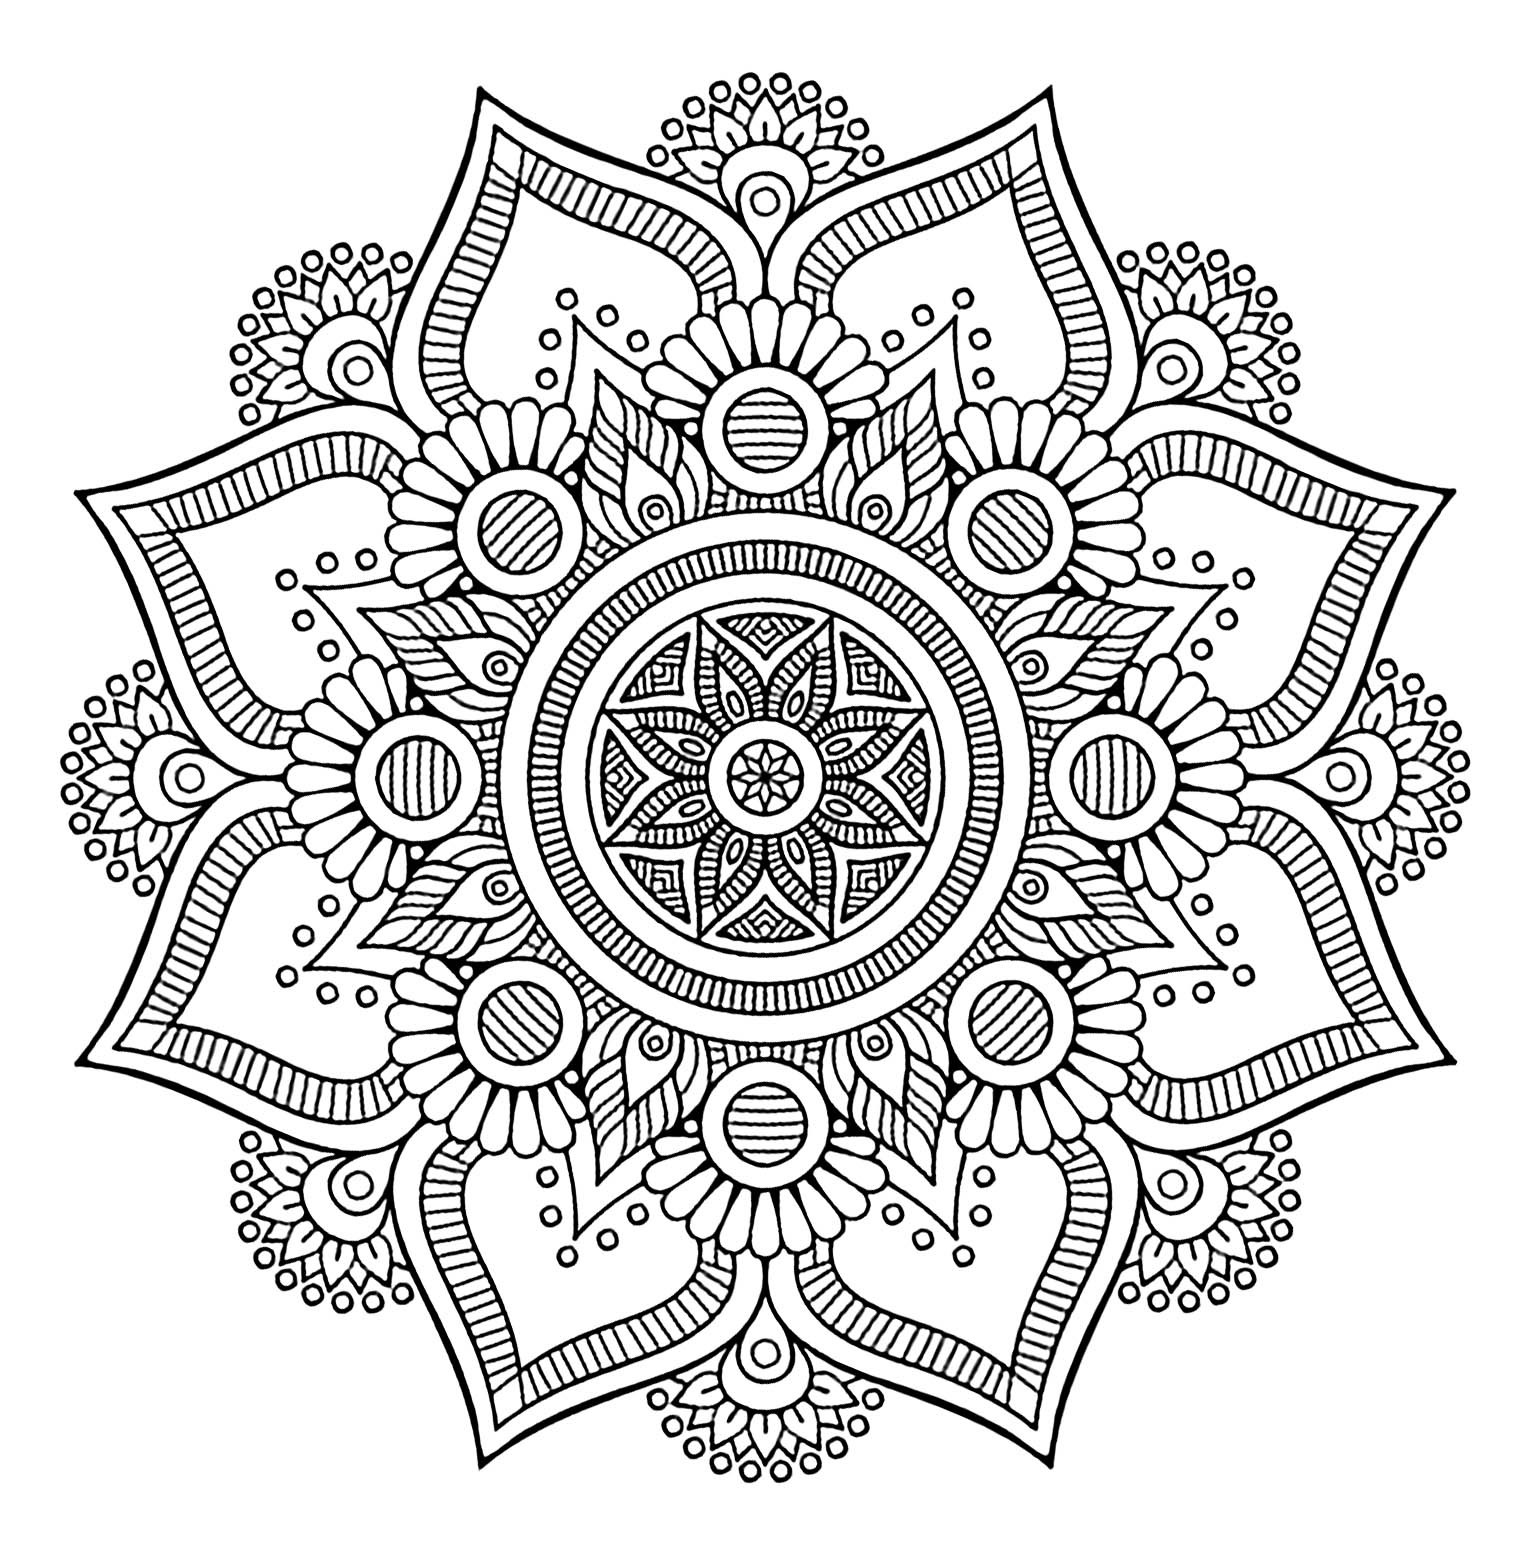 Colorear para Adultos : Mandalas - 4